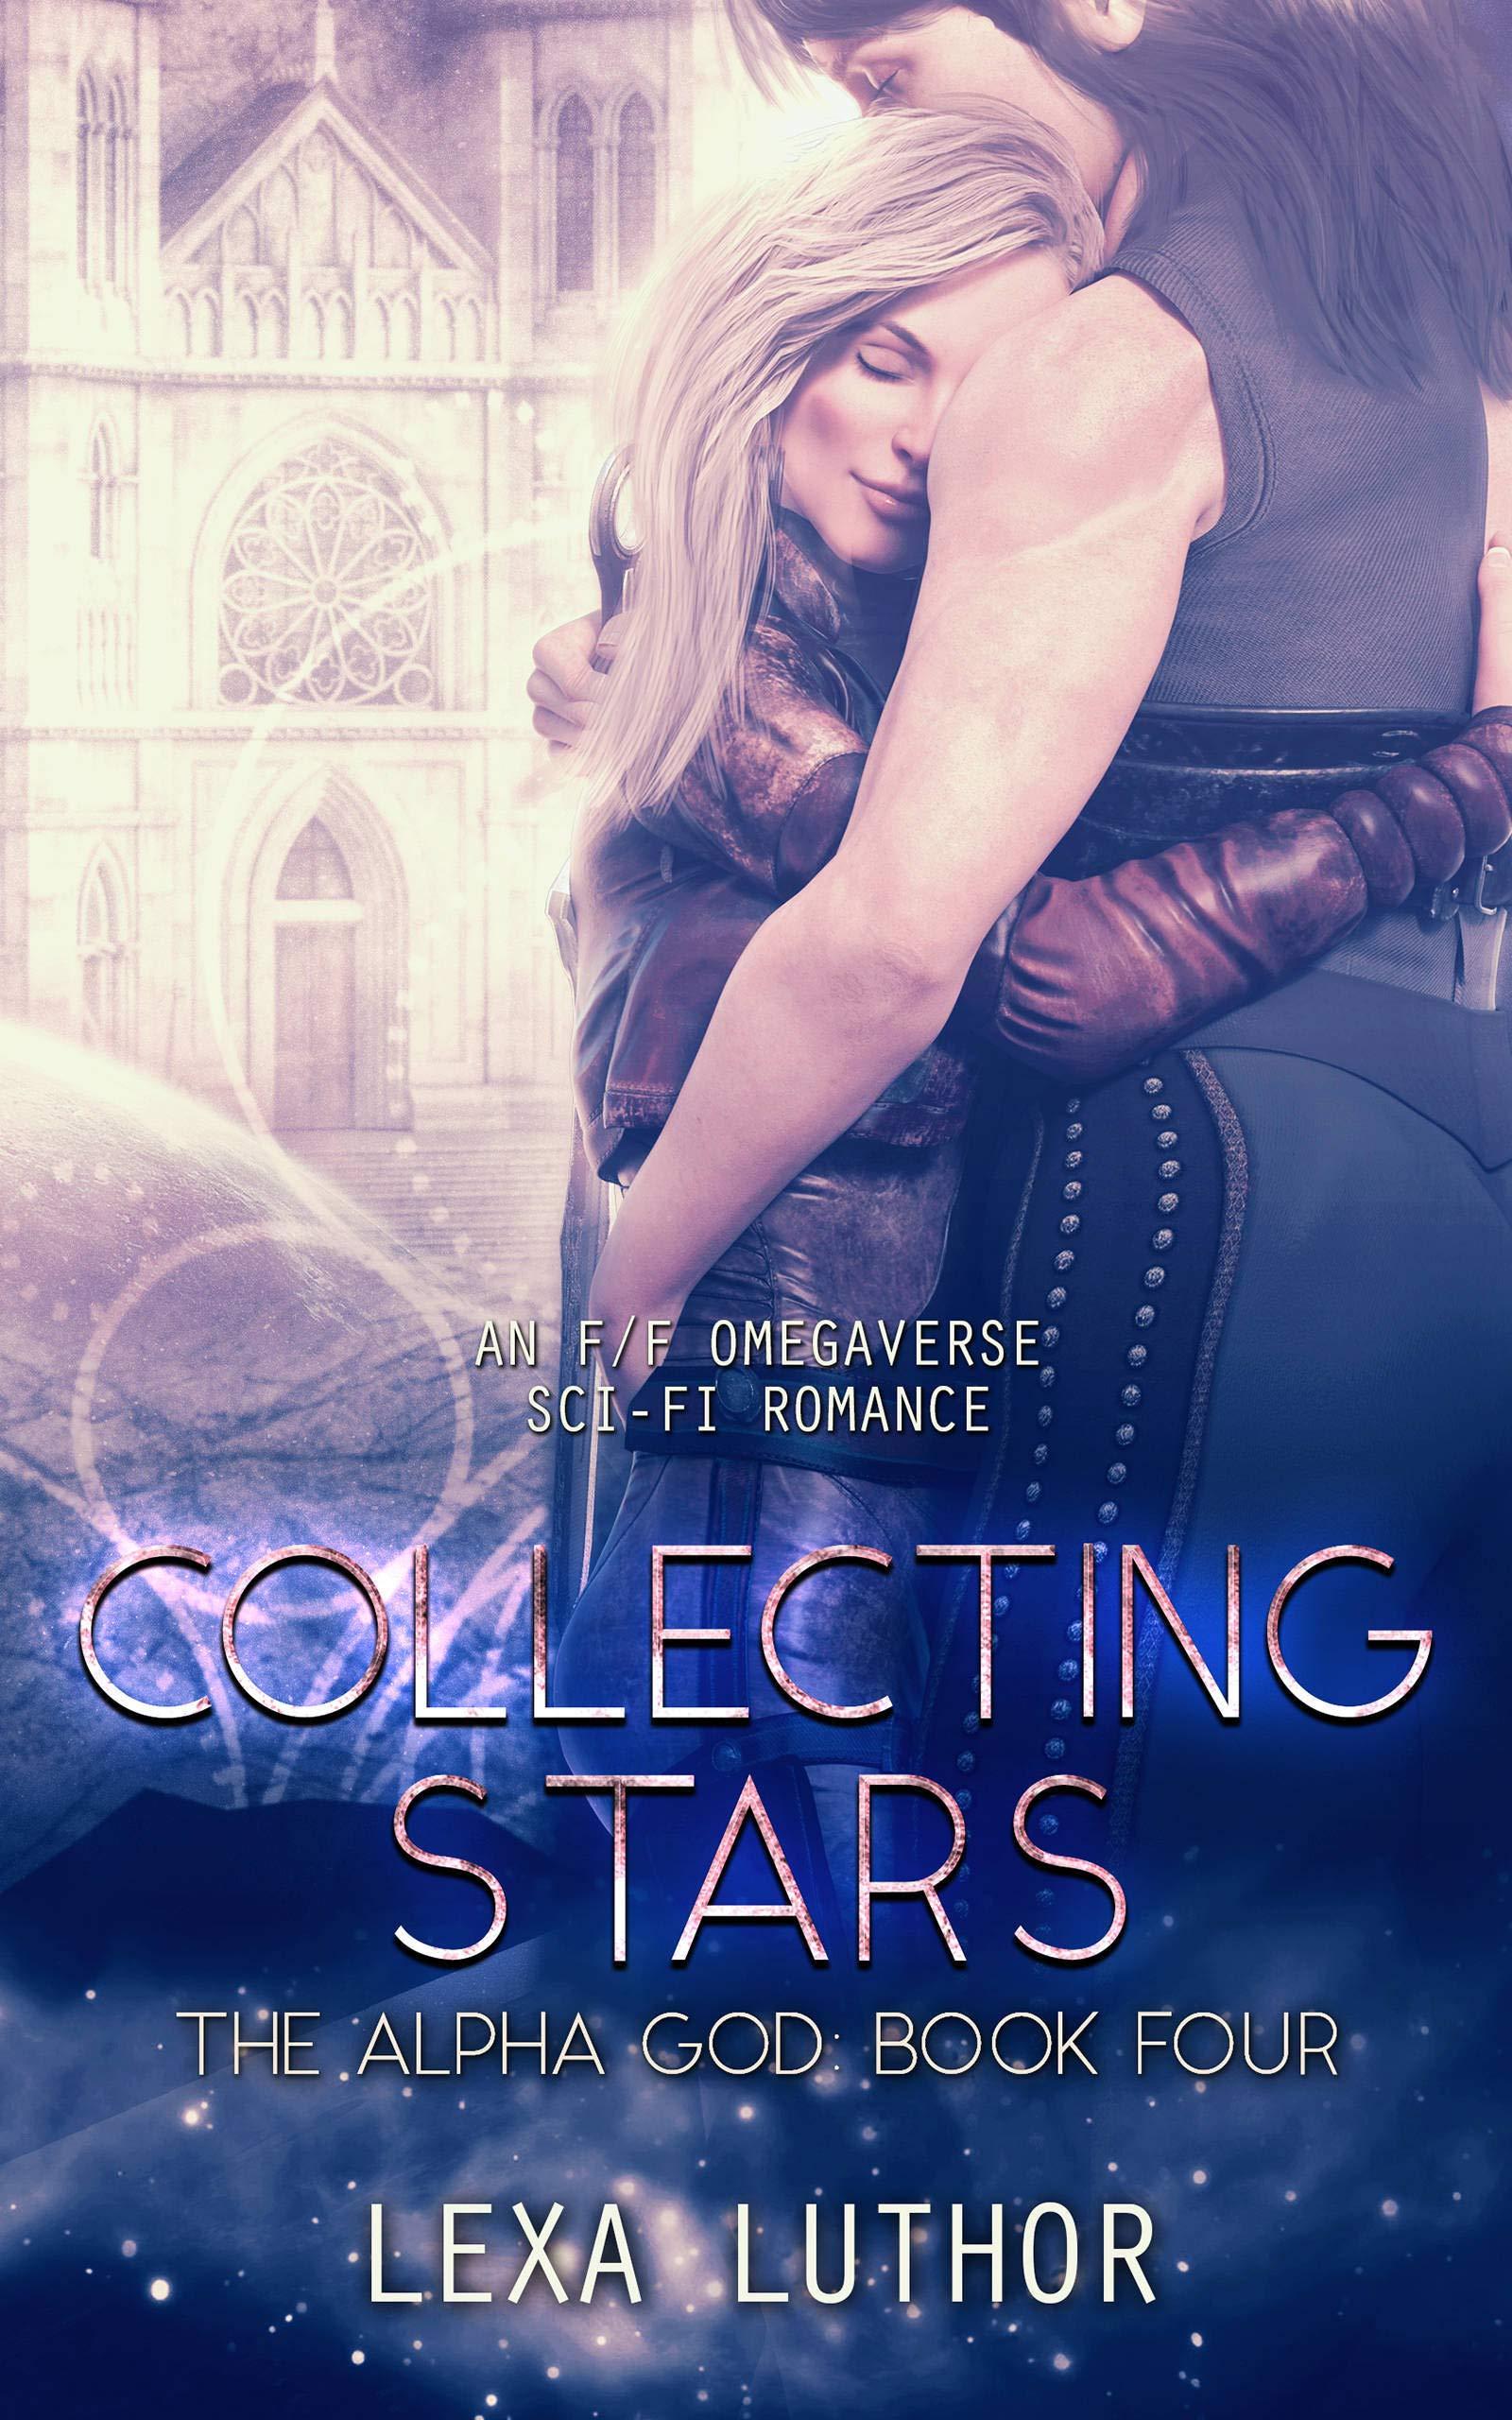 Collecting Stars: An F/F Omegaverse Sci-Fi Romance (The Alpha God Book 4)